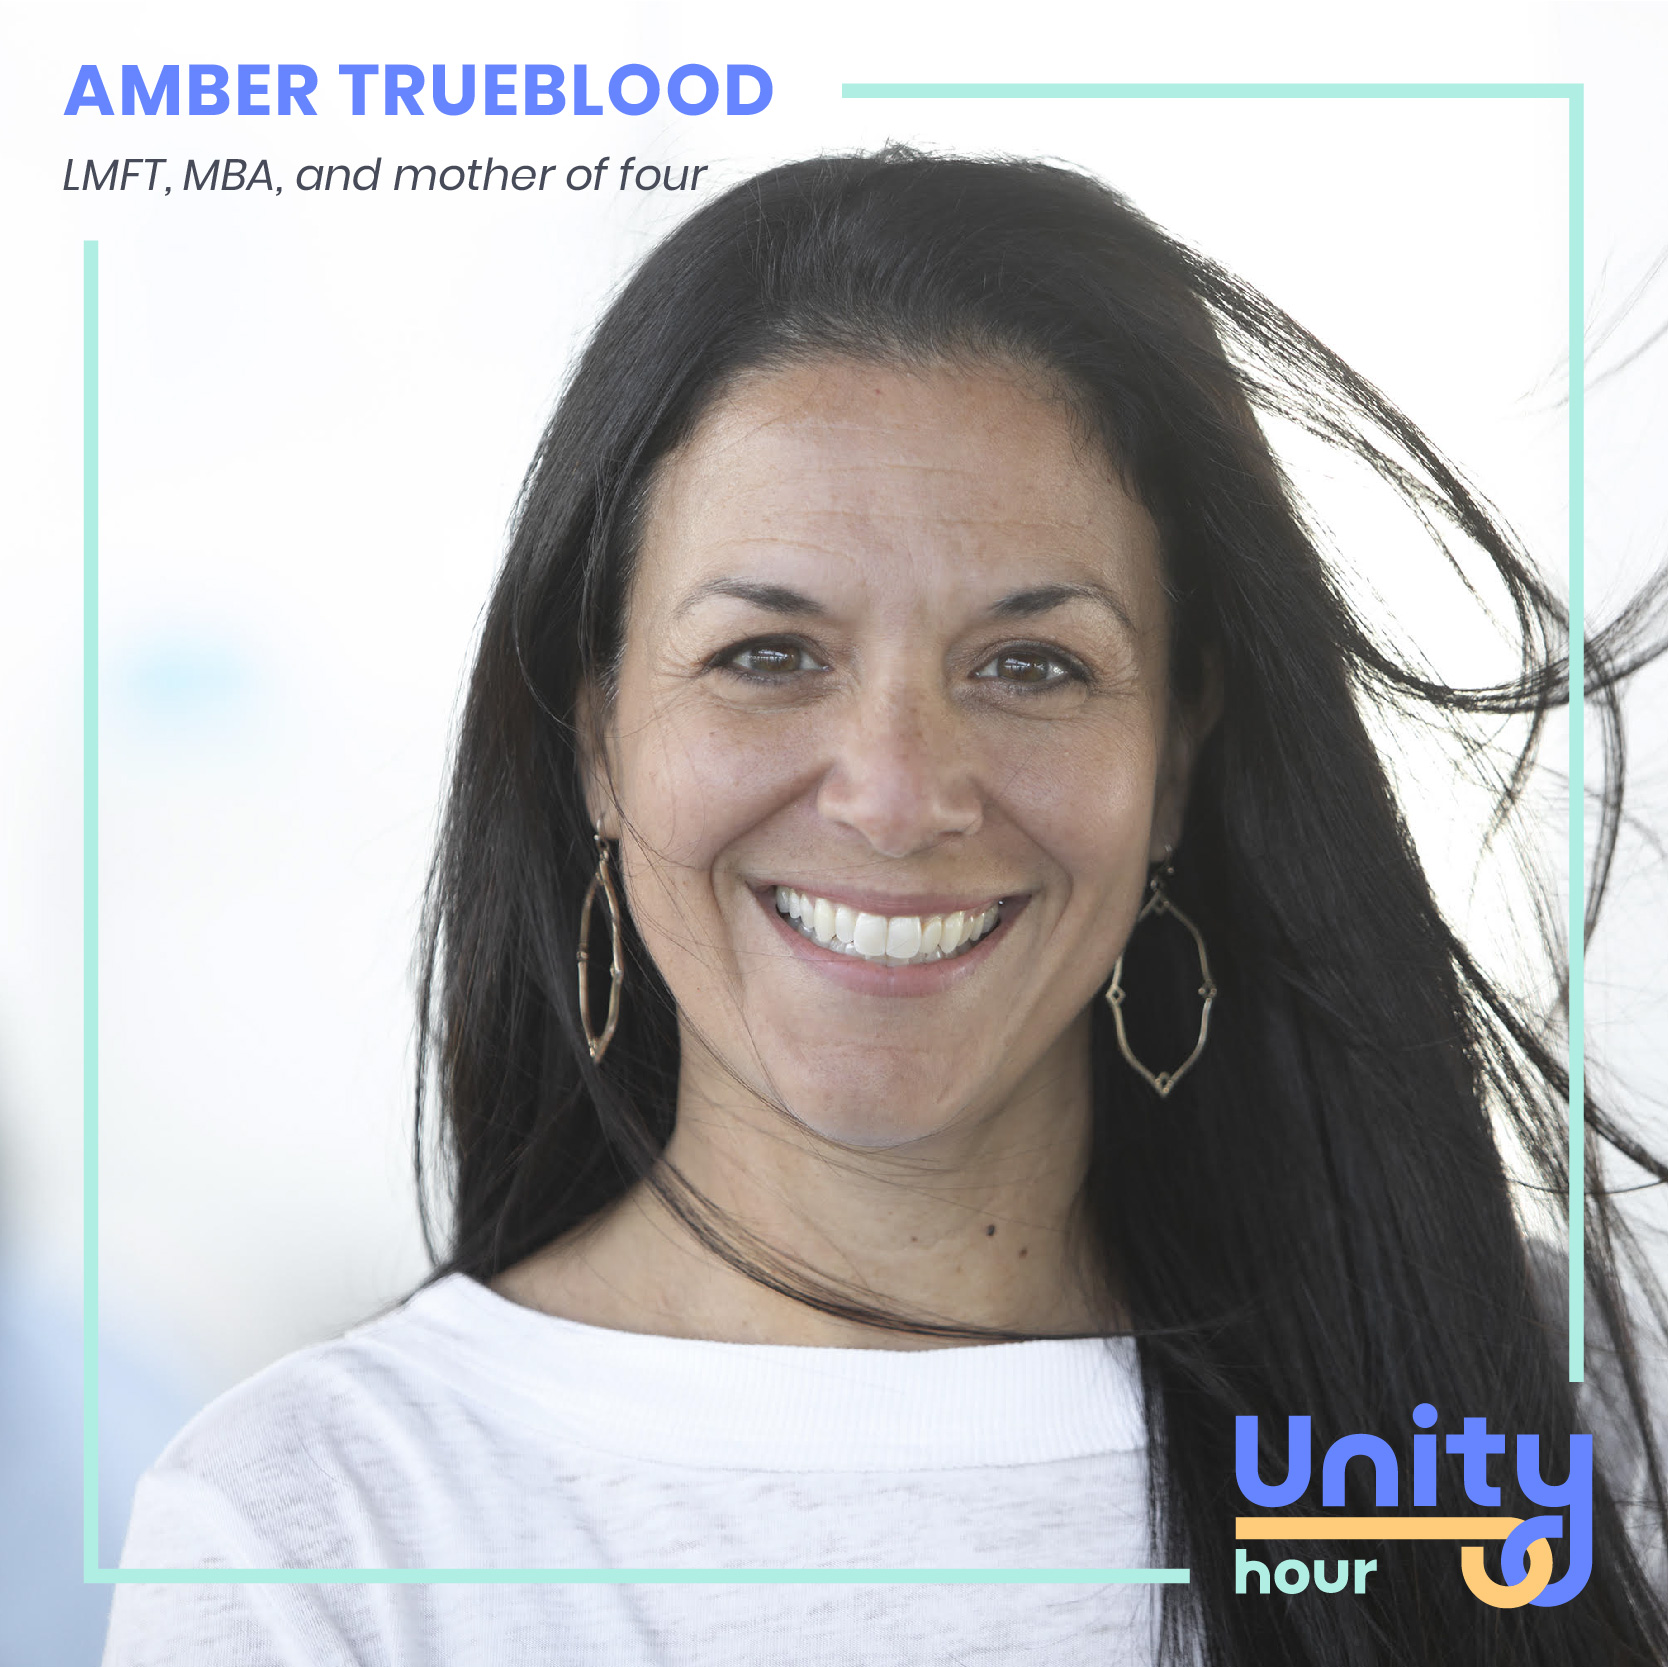 032520_Community_Unity-Hour_Amber-Trueblood-01